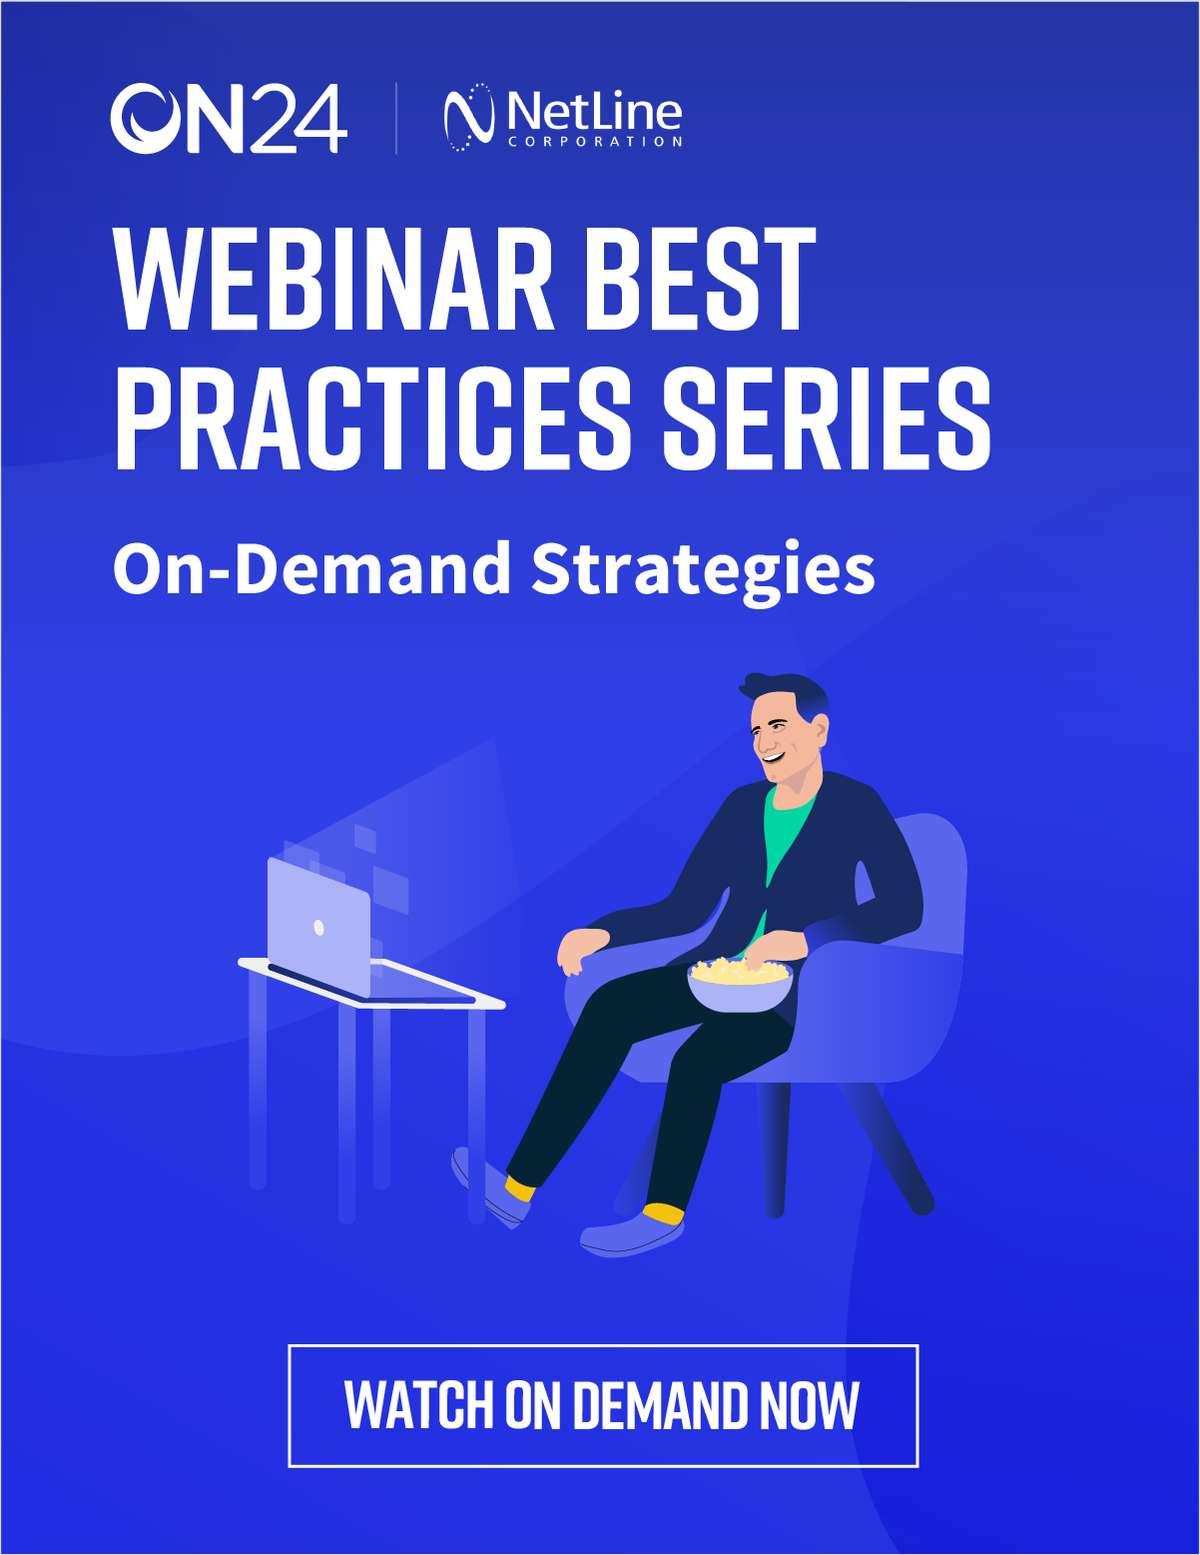 On-Demand Strategies